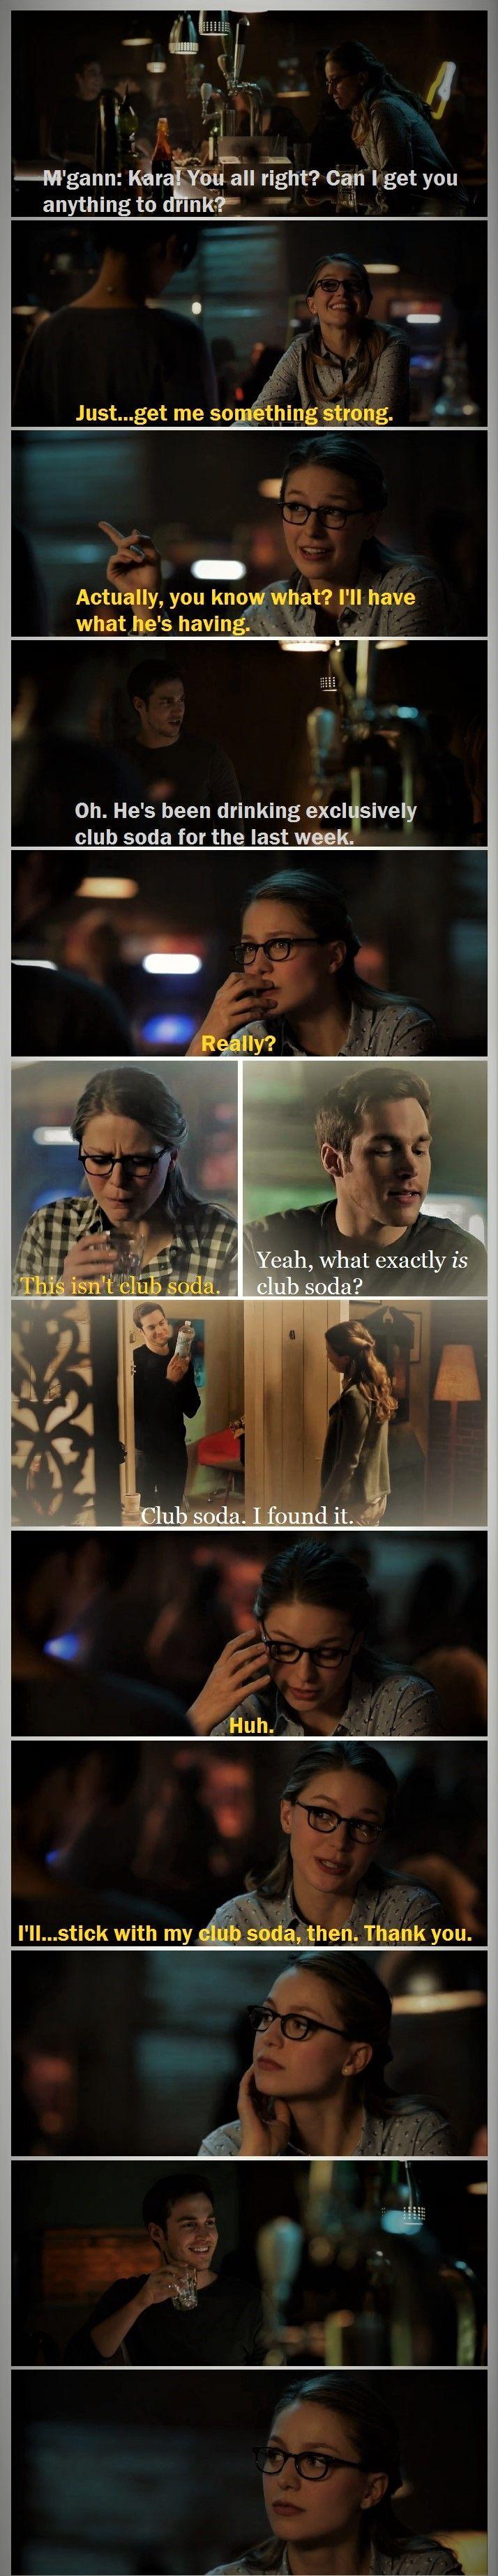 Kara and Mon-El are making me CRAVE club soda. It's both cute and annoying. (Side note: I love how M'gann is like the all-knowing bartender in this scene. She gets Kara's mood.) |TV Shows||CW||#Supergirl edit||2x11||2x09||Kara x Mon-El||#Karamel edit||Kara Danvers||Melissa Benoist||Chris Wood||#DCTV|